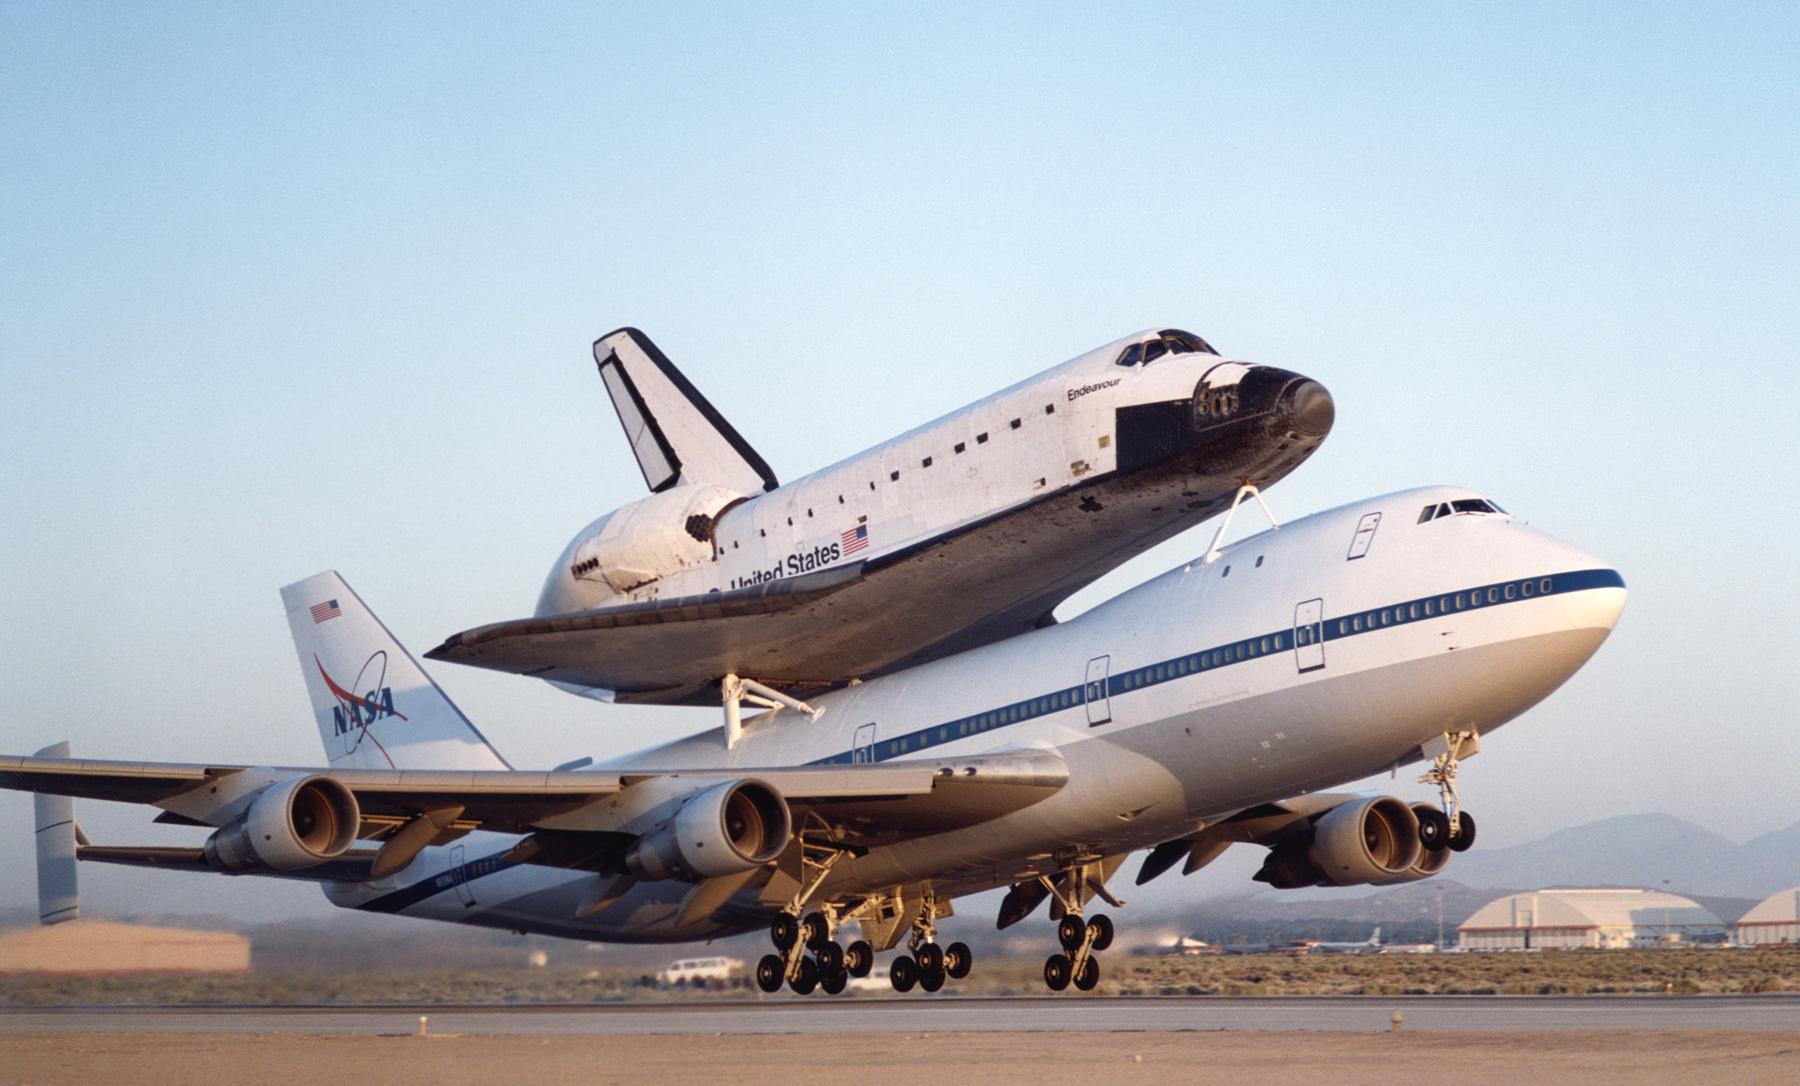 nasa transport plane - photo #33